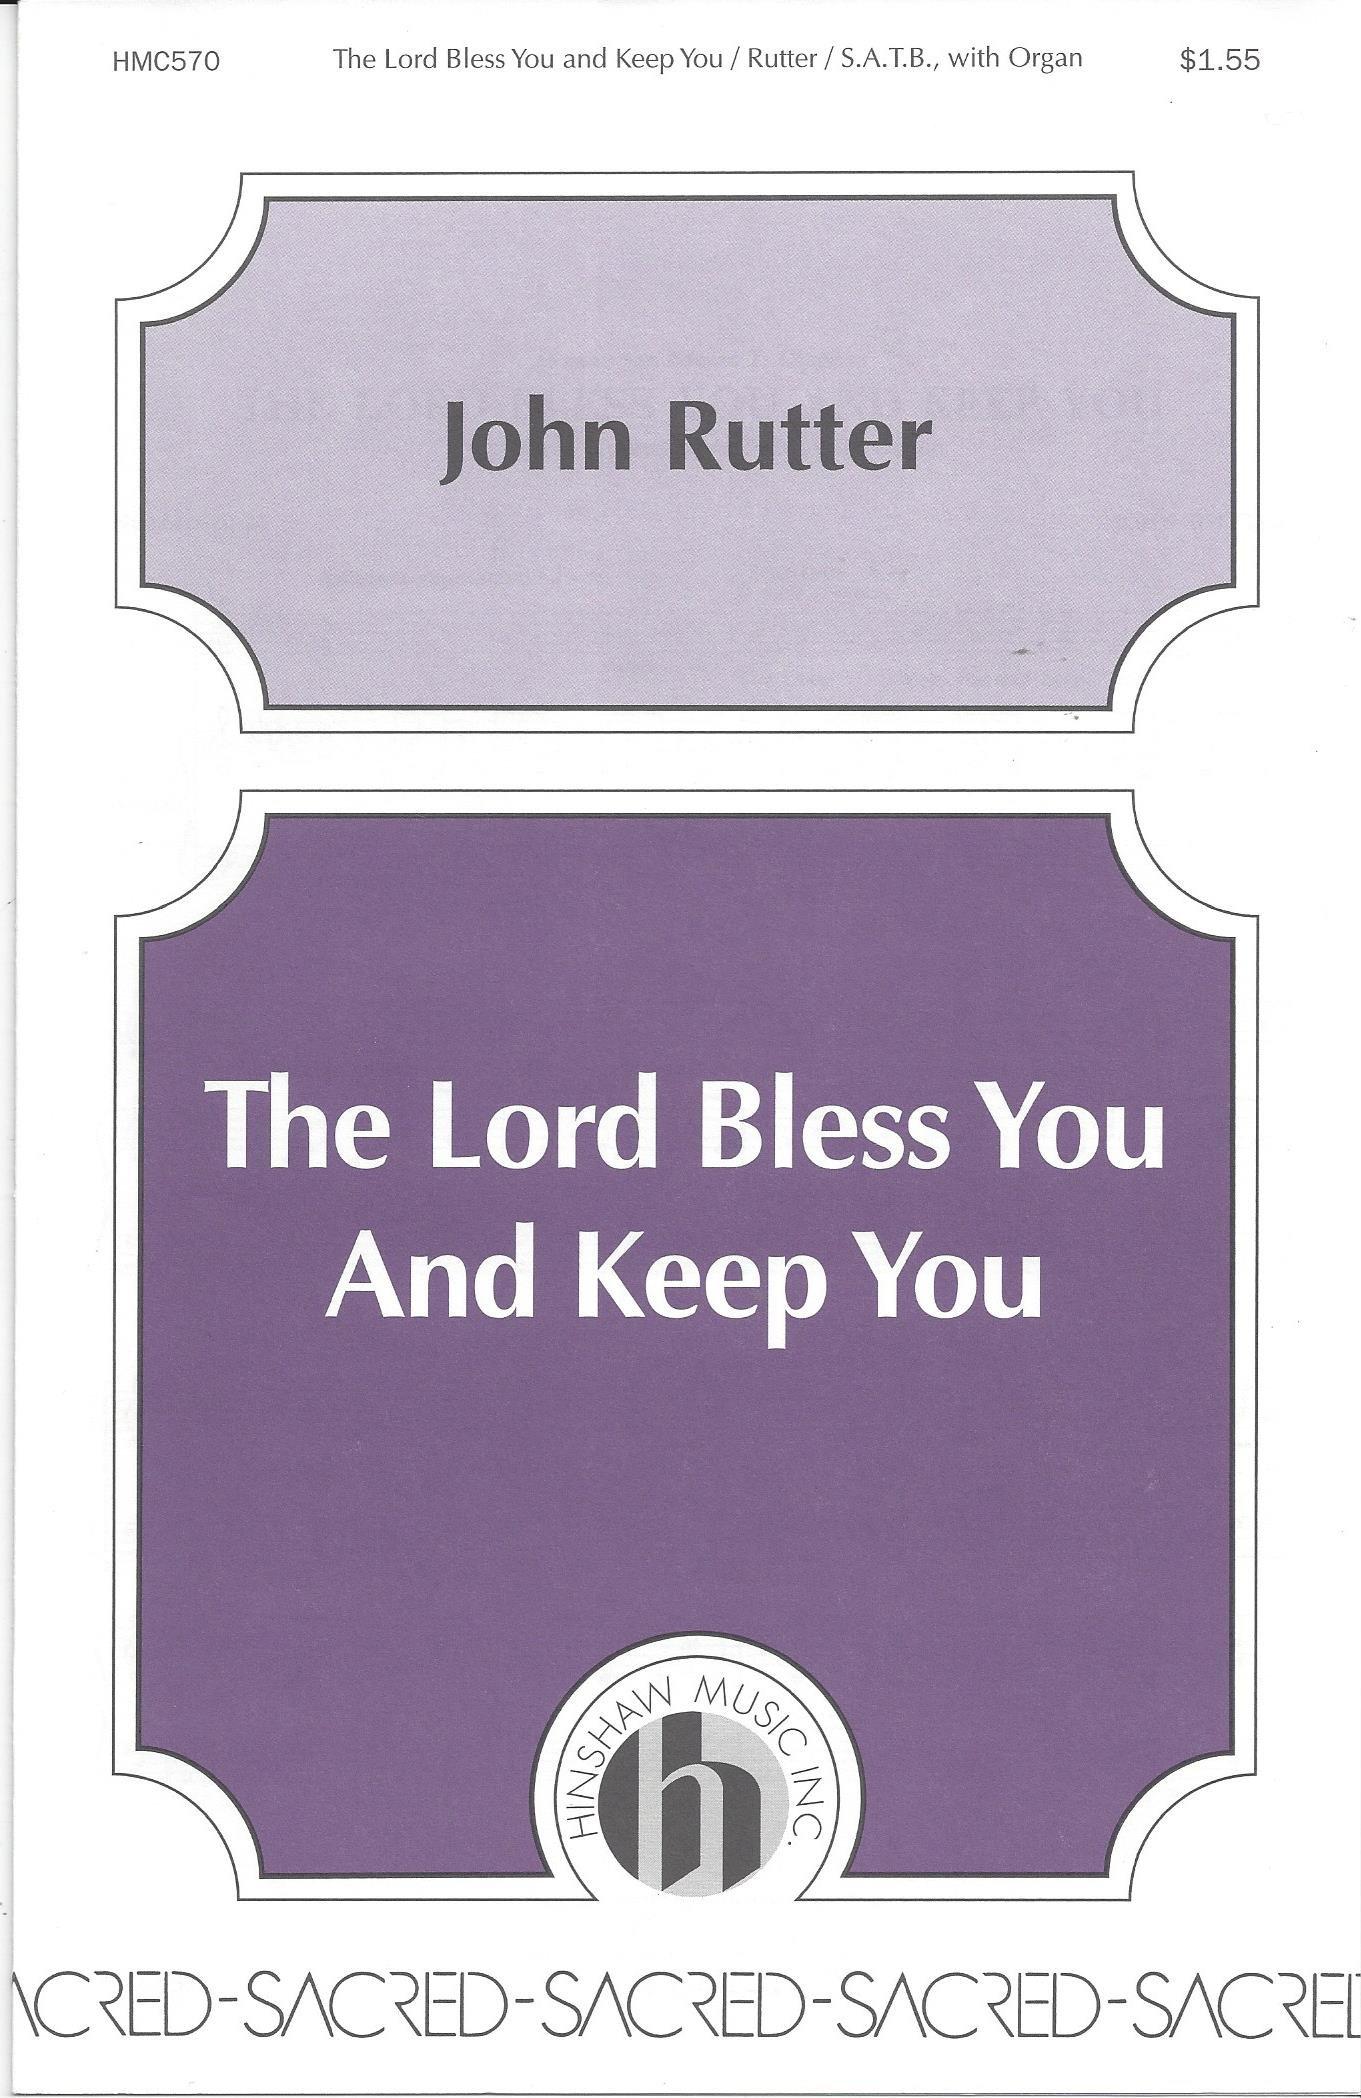 The Lord Bless You and Keep You - John Rutter - SATB Choir & Organ/Piano